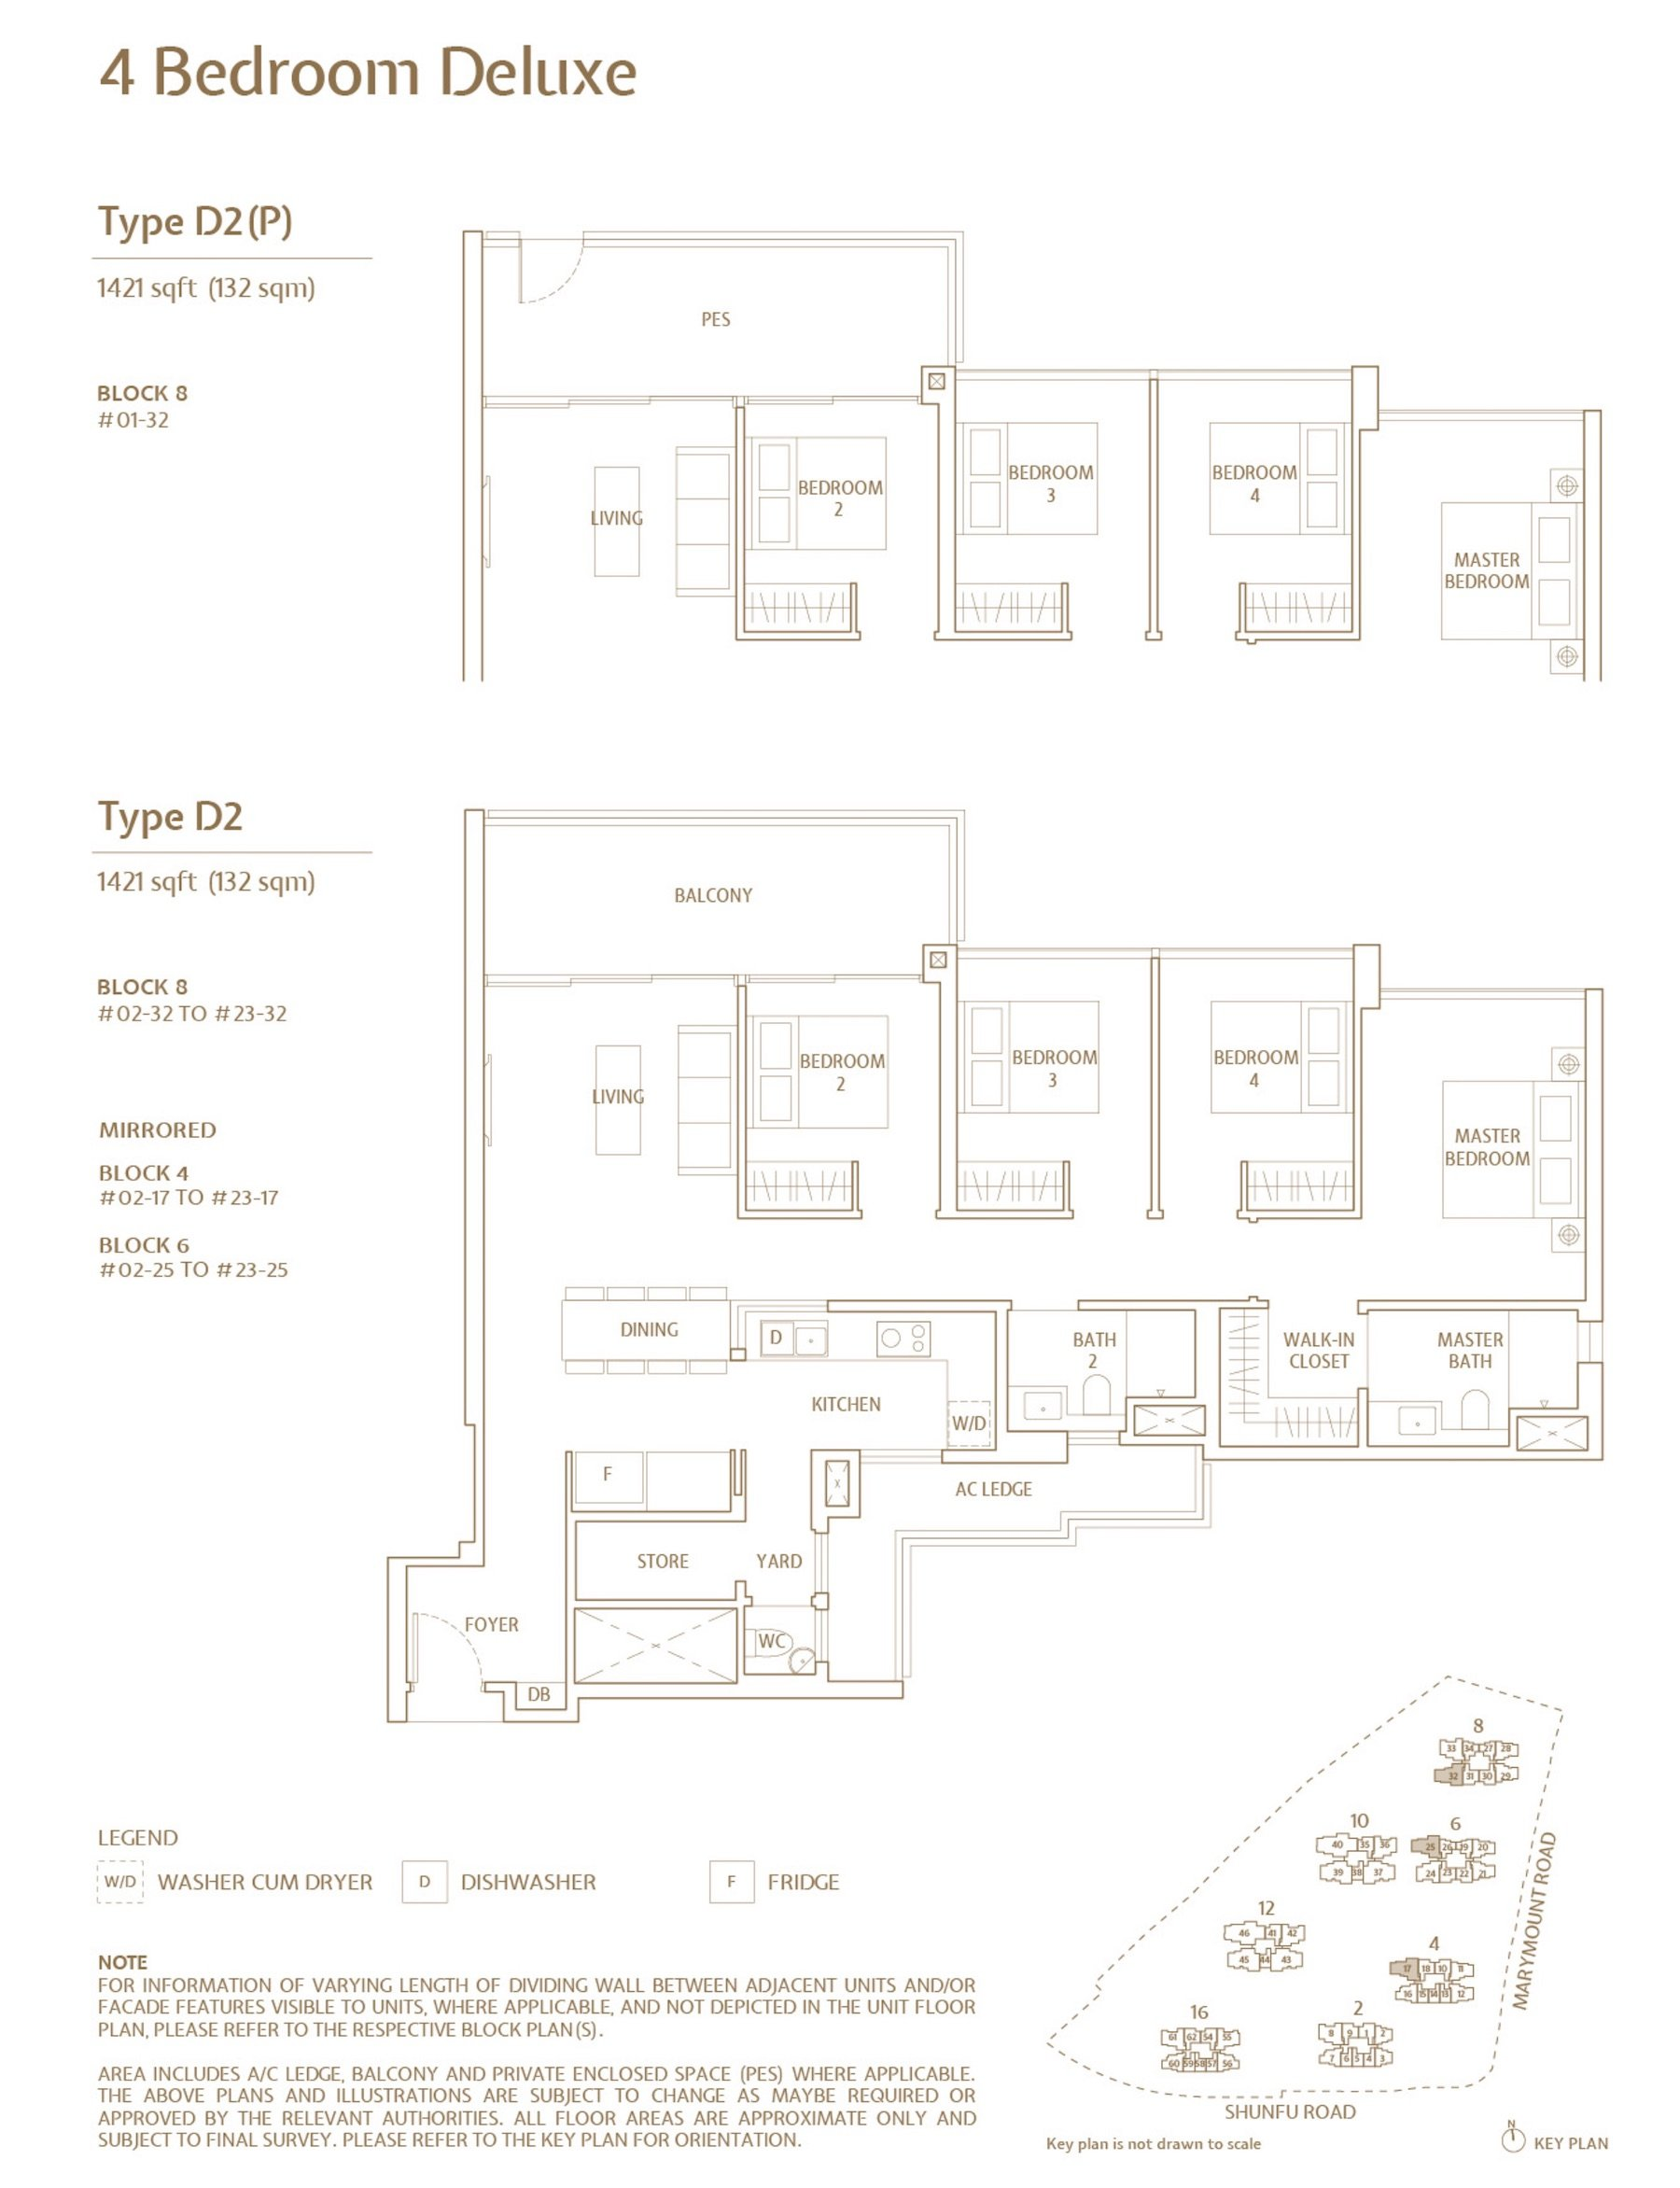 Jadescape 顺福轩 condo 4 bedroom type D2